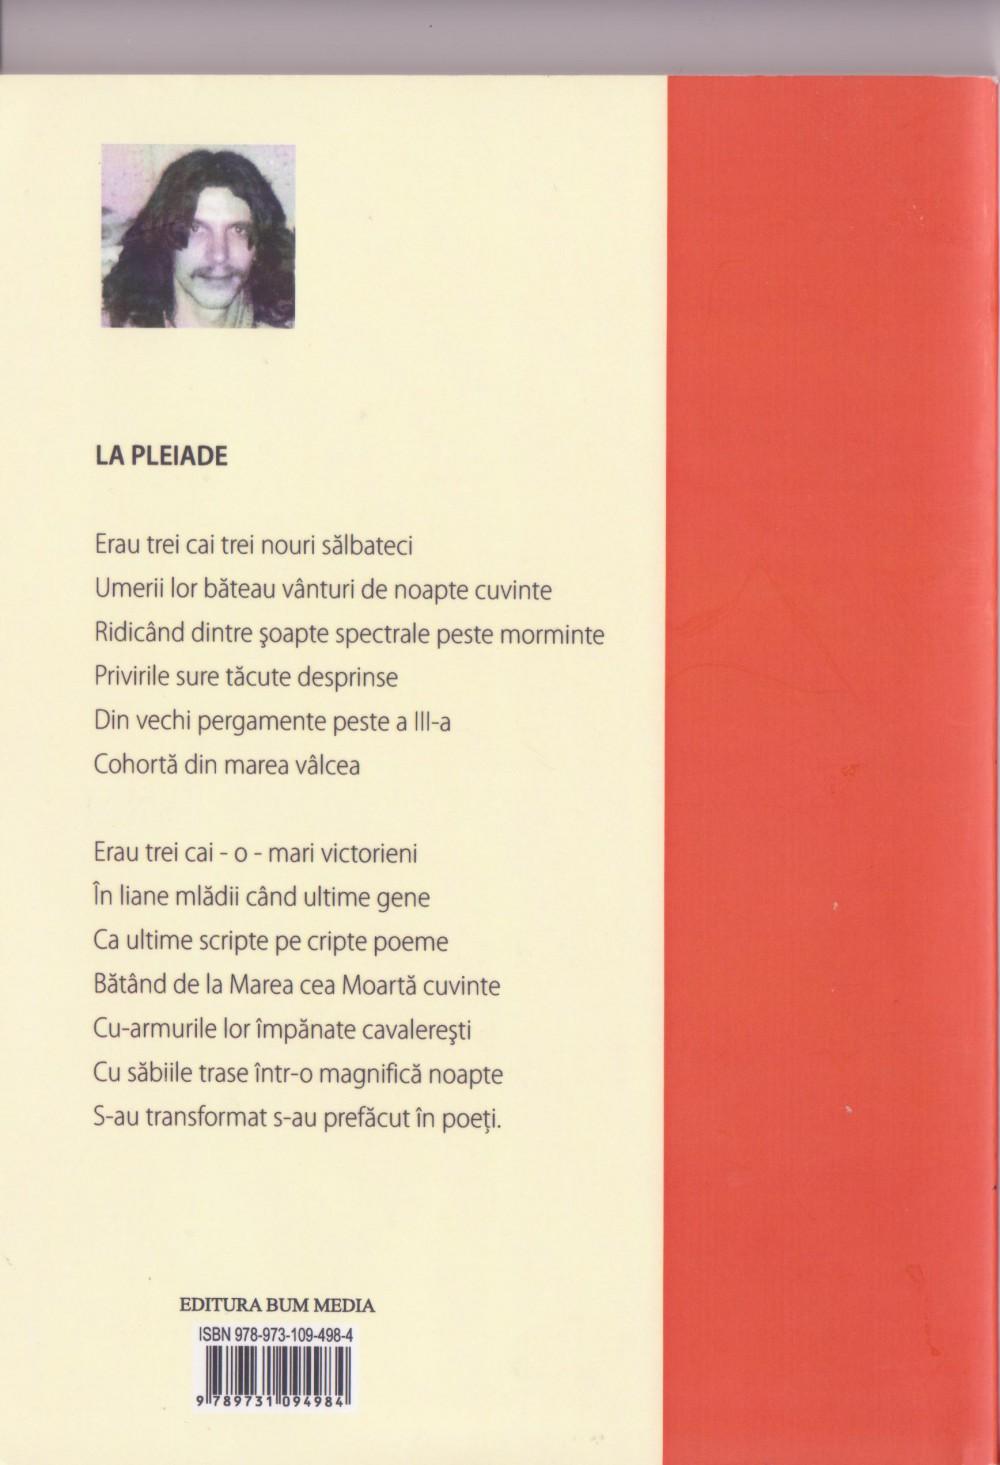 Horia Muntenus, Poesii, verso